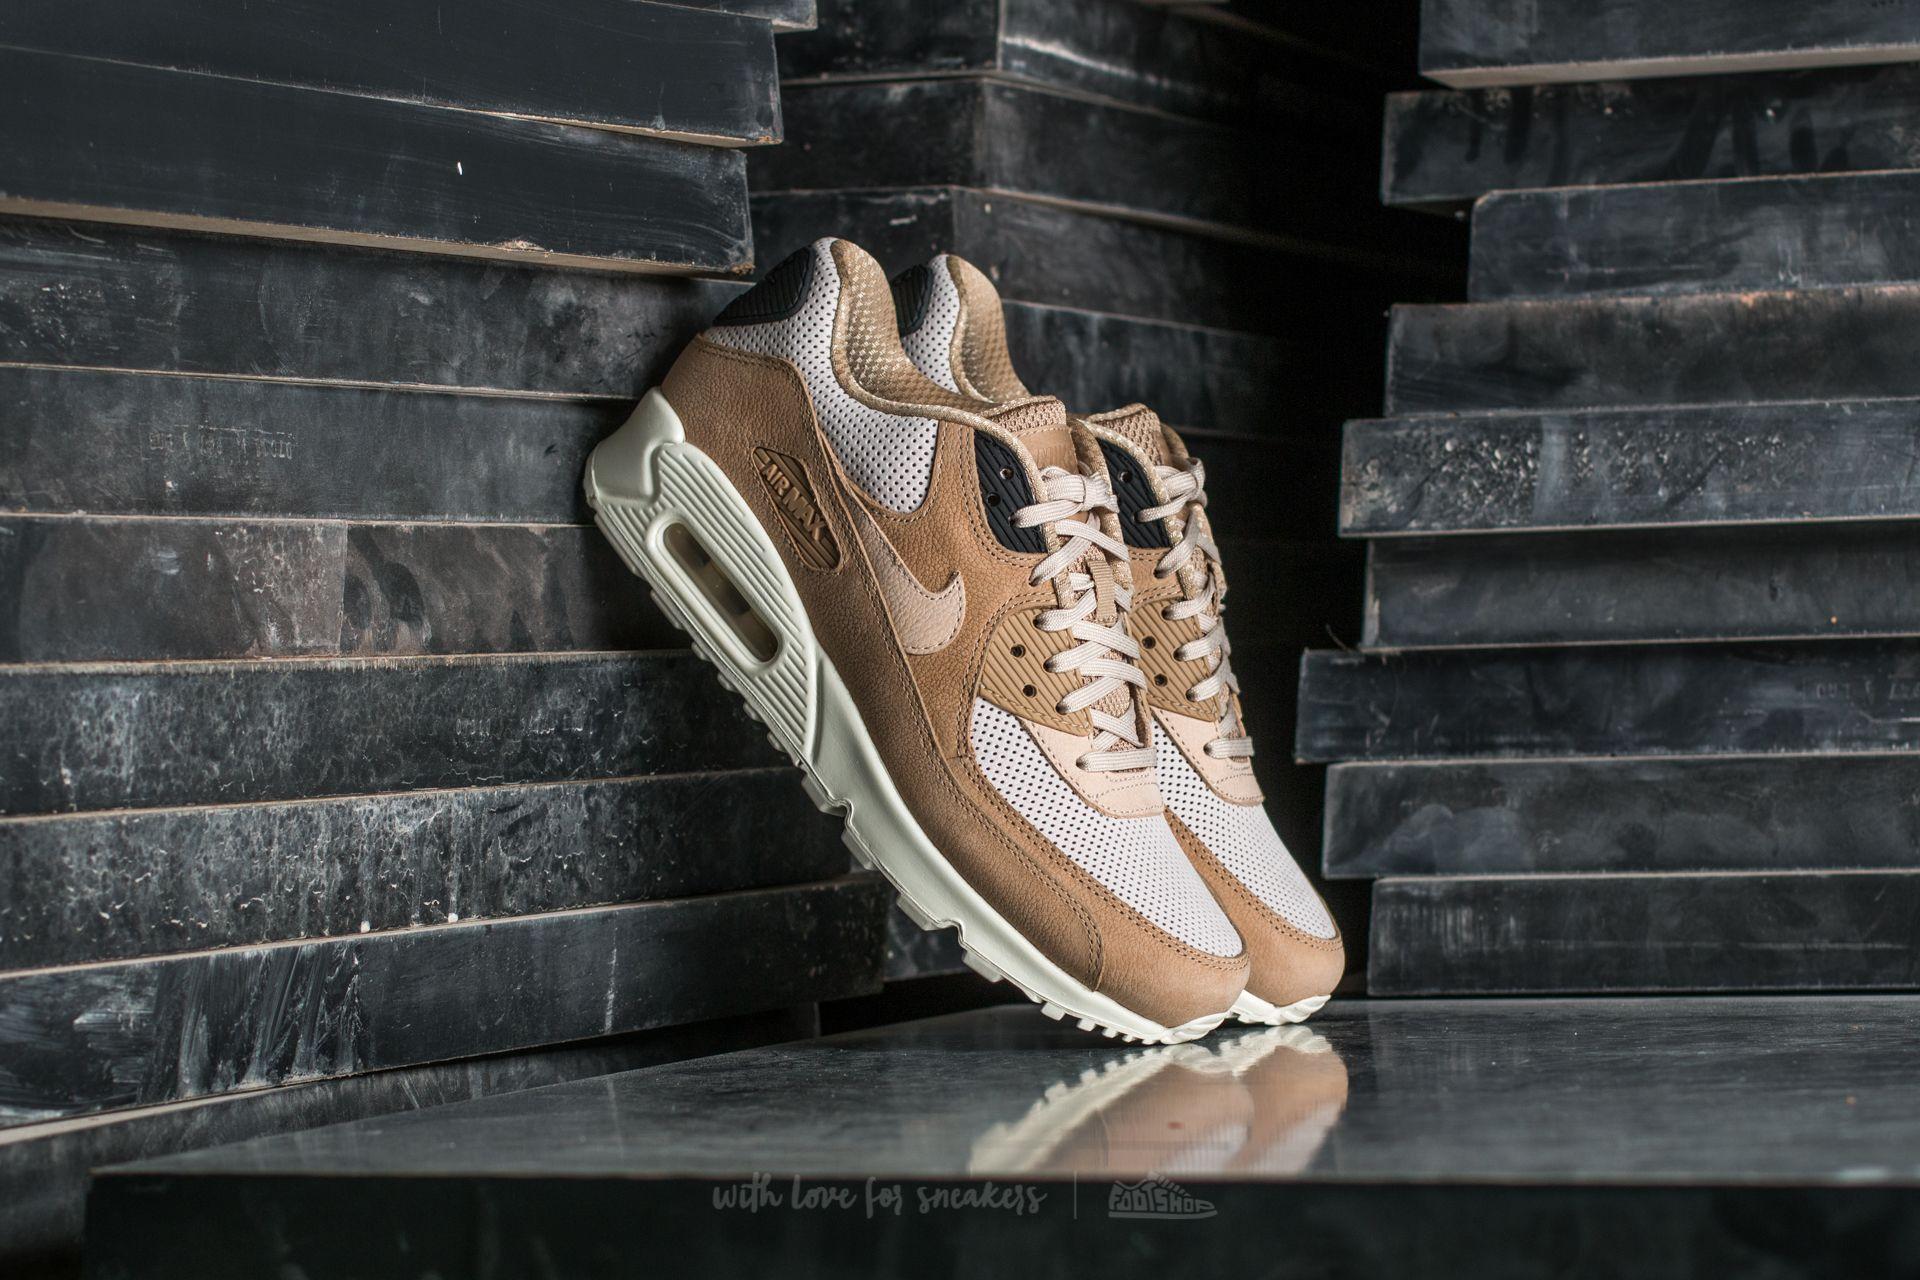 Nike Wmns Air Max 90 Pinnacle Mushroom  Oatmeal-Light Bone  718628d152d